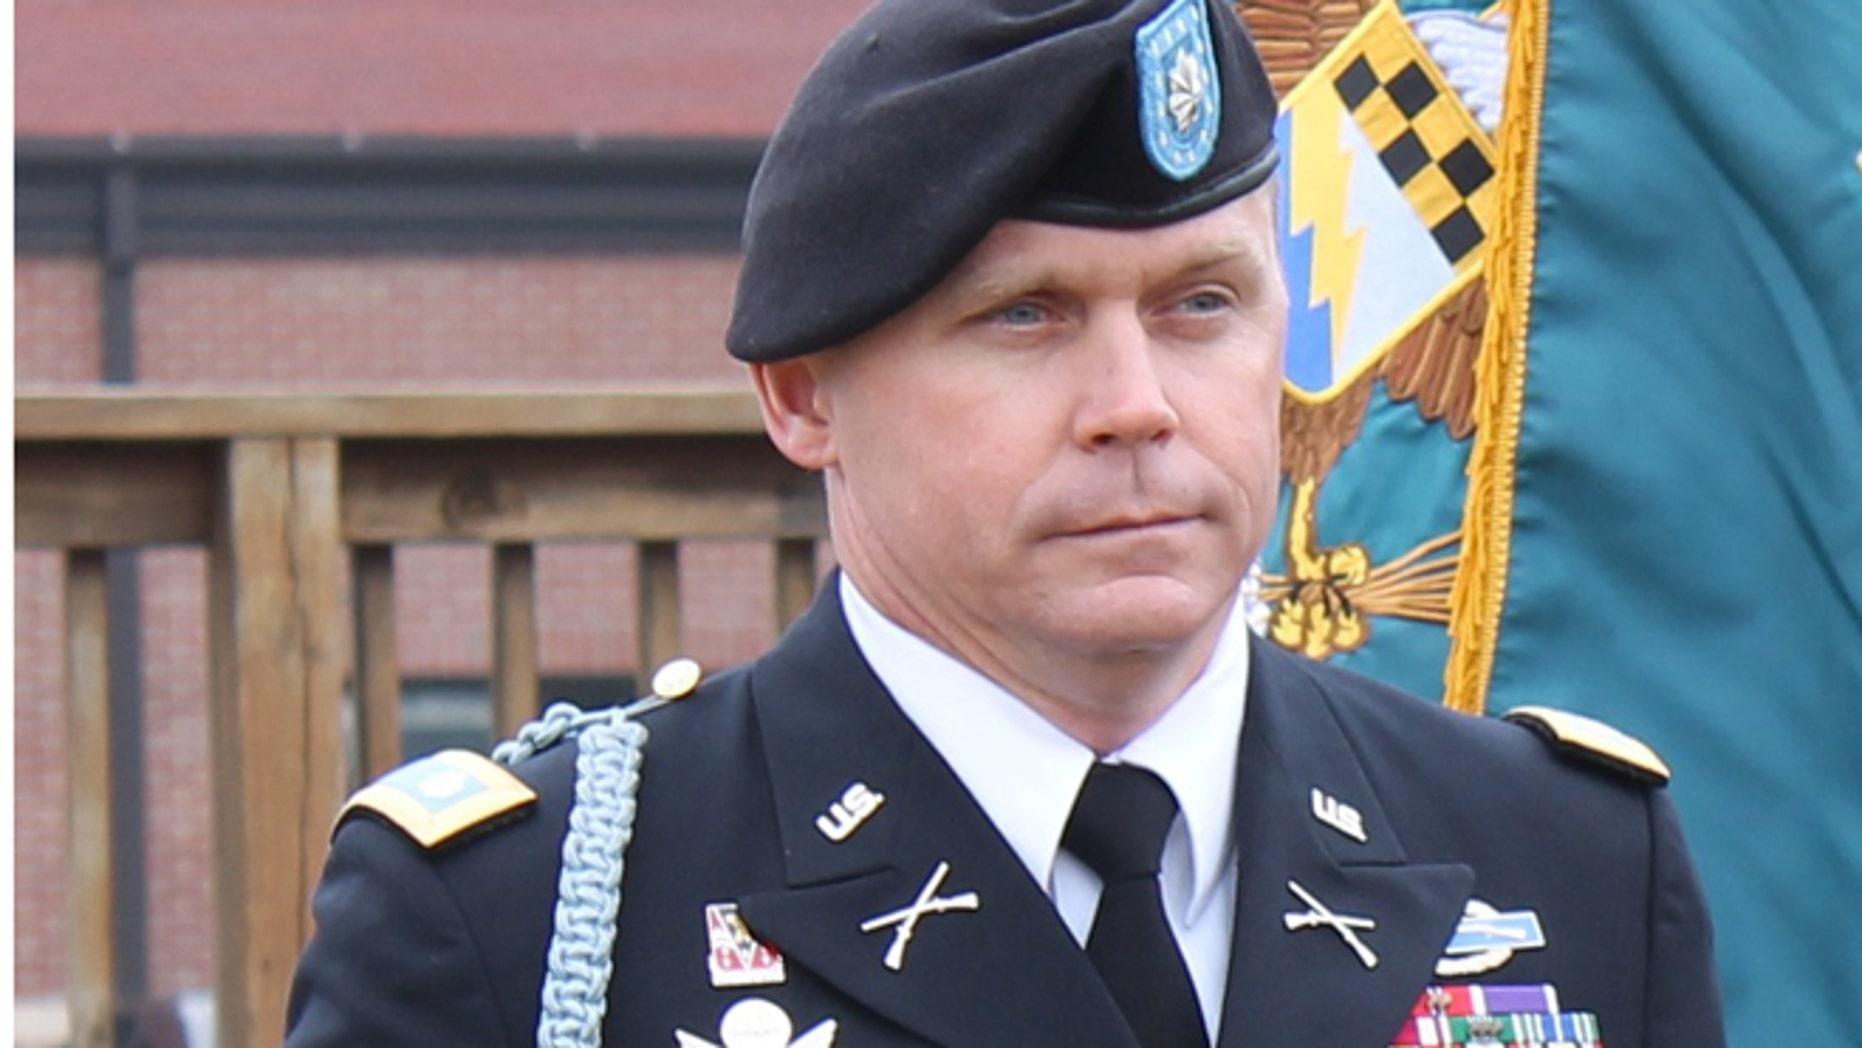 Lt. Col. Roy L. Tisdale, commander of the 525th Brigade Special Troops Battalion, 525th Battlefield Surveillance Brigade.